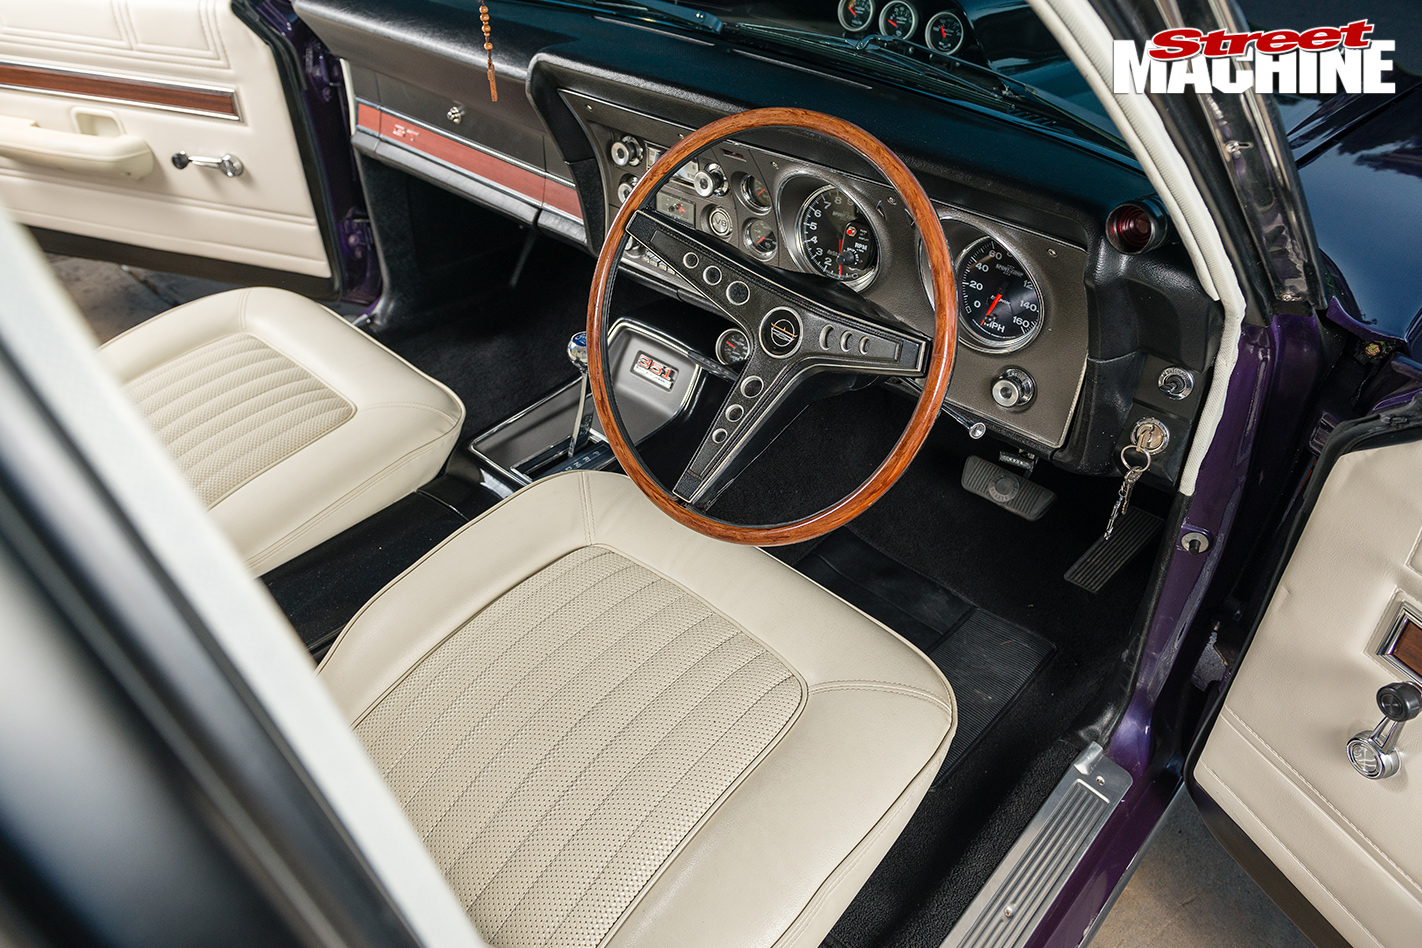 CHRIS GAUCI S 1969 FORD FALCON XY GT interior